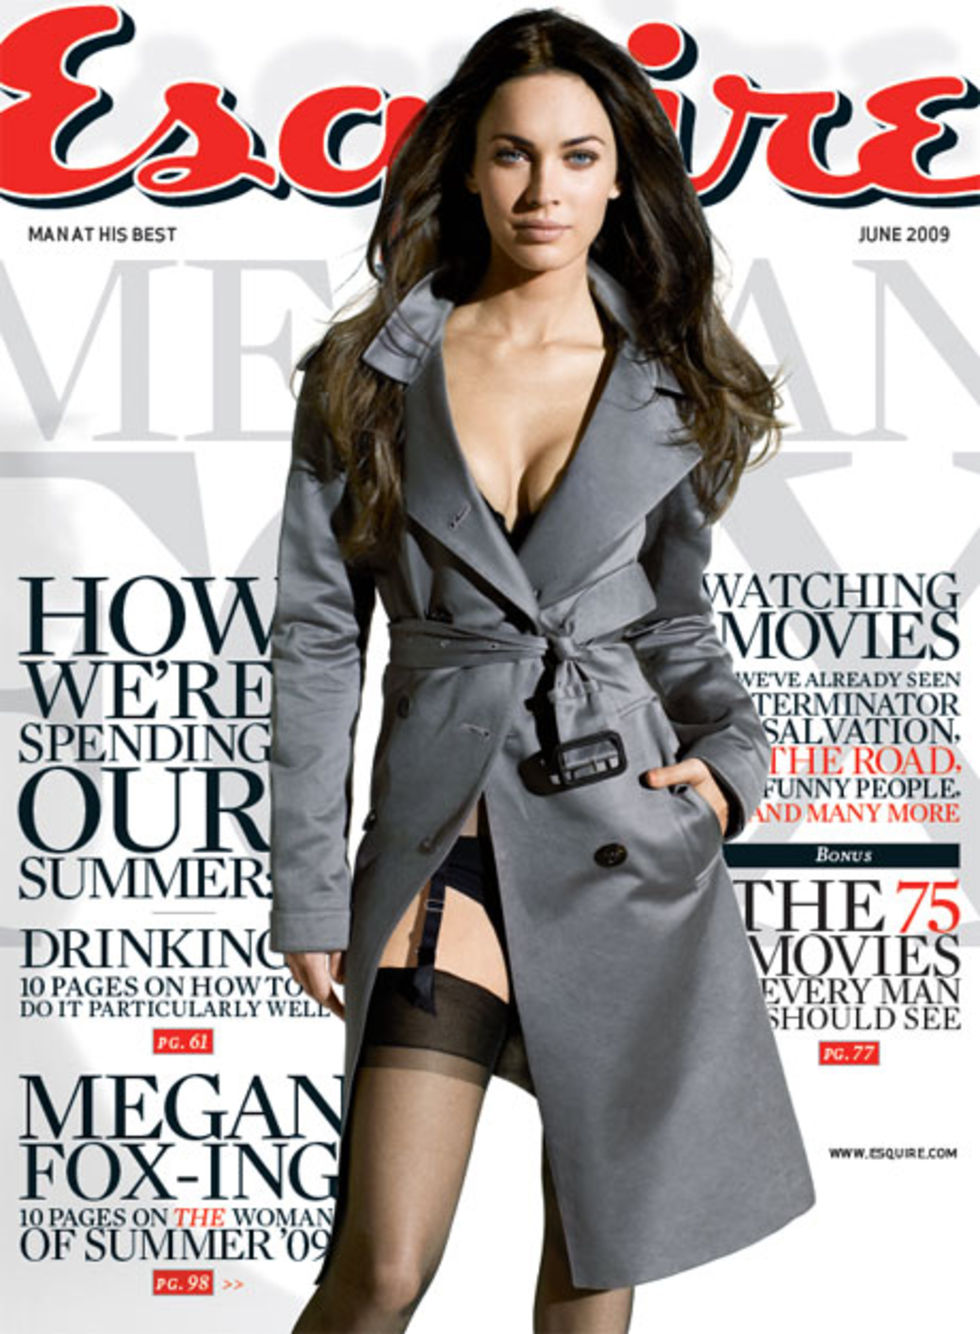 megan-fox-good-morning-megan-fox-video-esquire-magazine-01